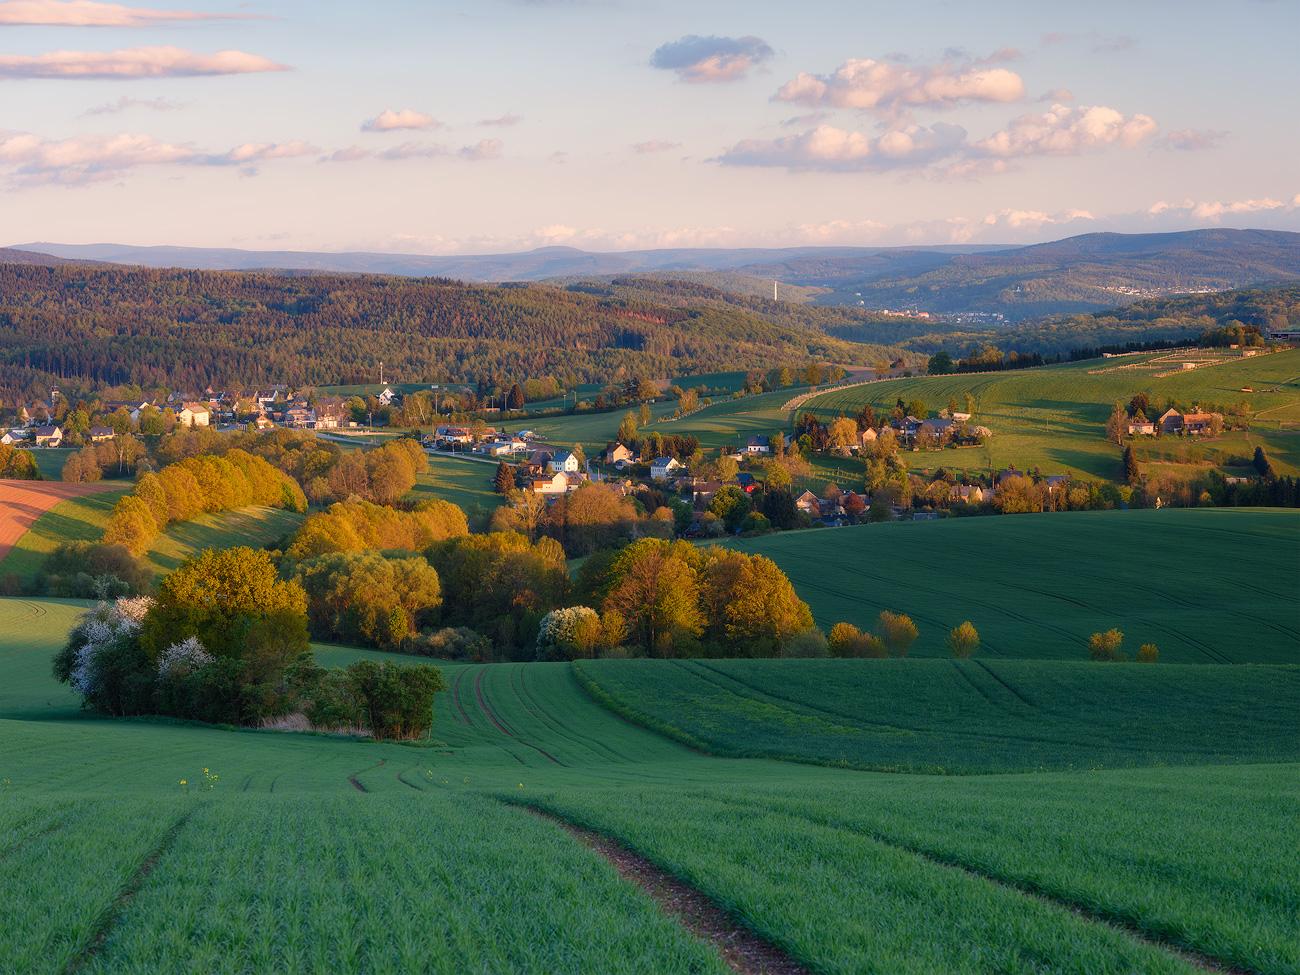 Hartenstein, Erzgebirge, Germany by Nils Leonhardt